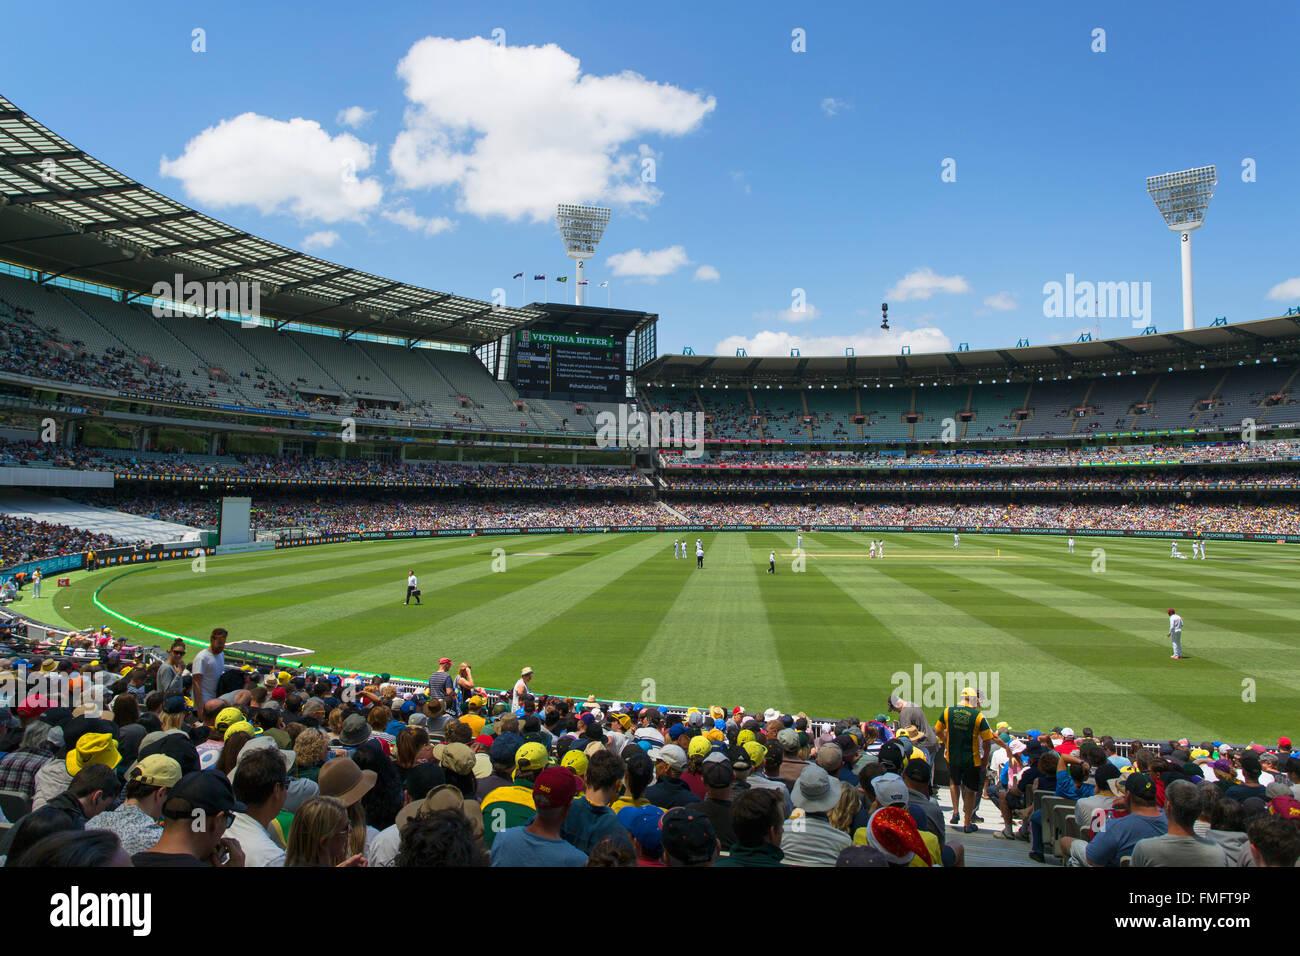 Cricket match at Melbourne Cricket Ground (MCG), Melbourne, Victoria, Australia - Stock Image